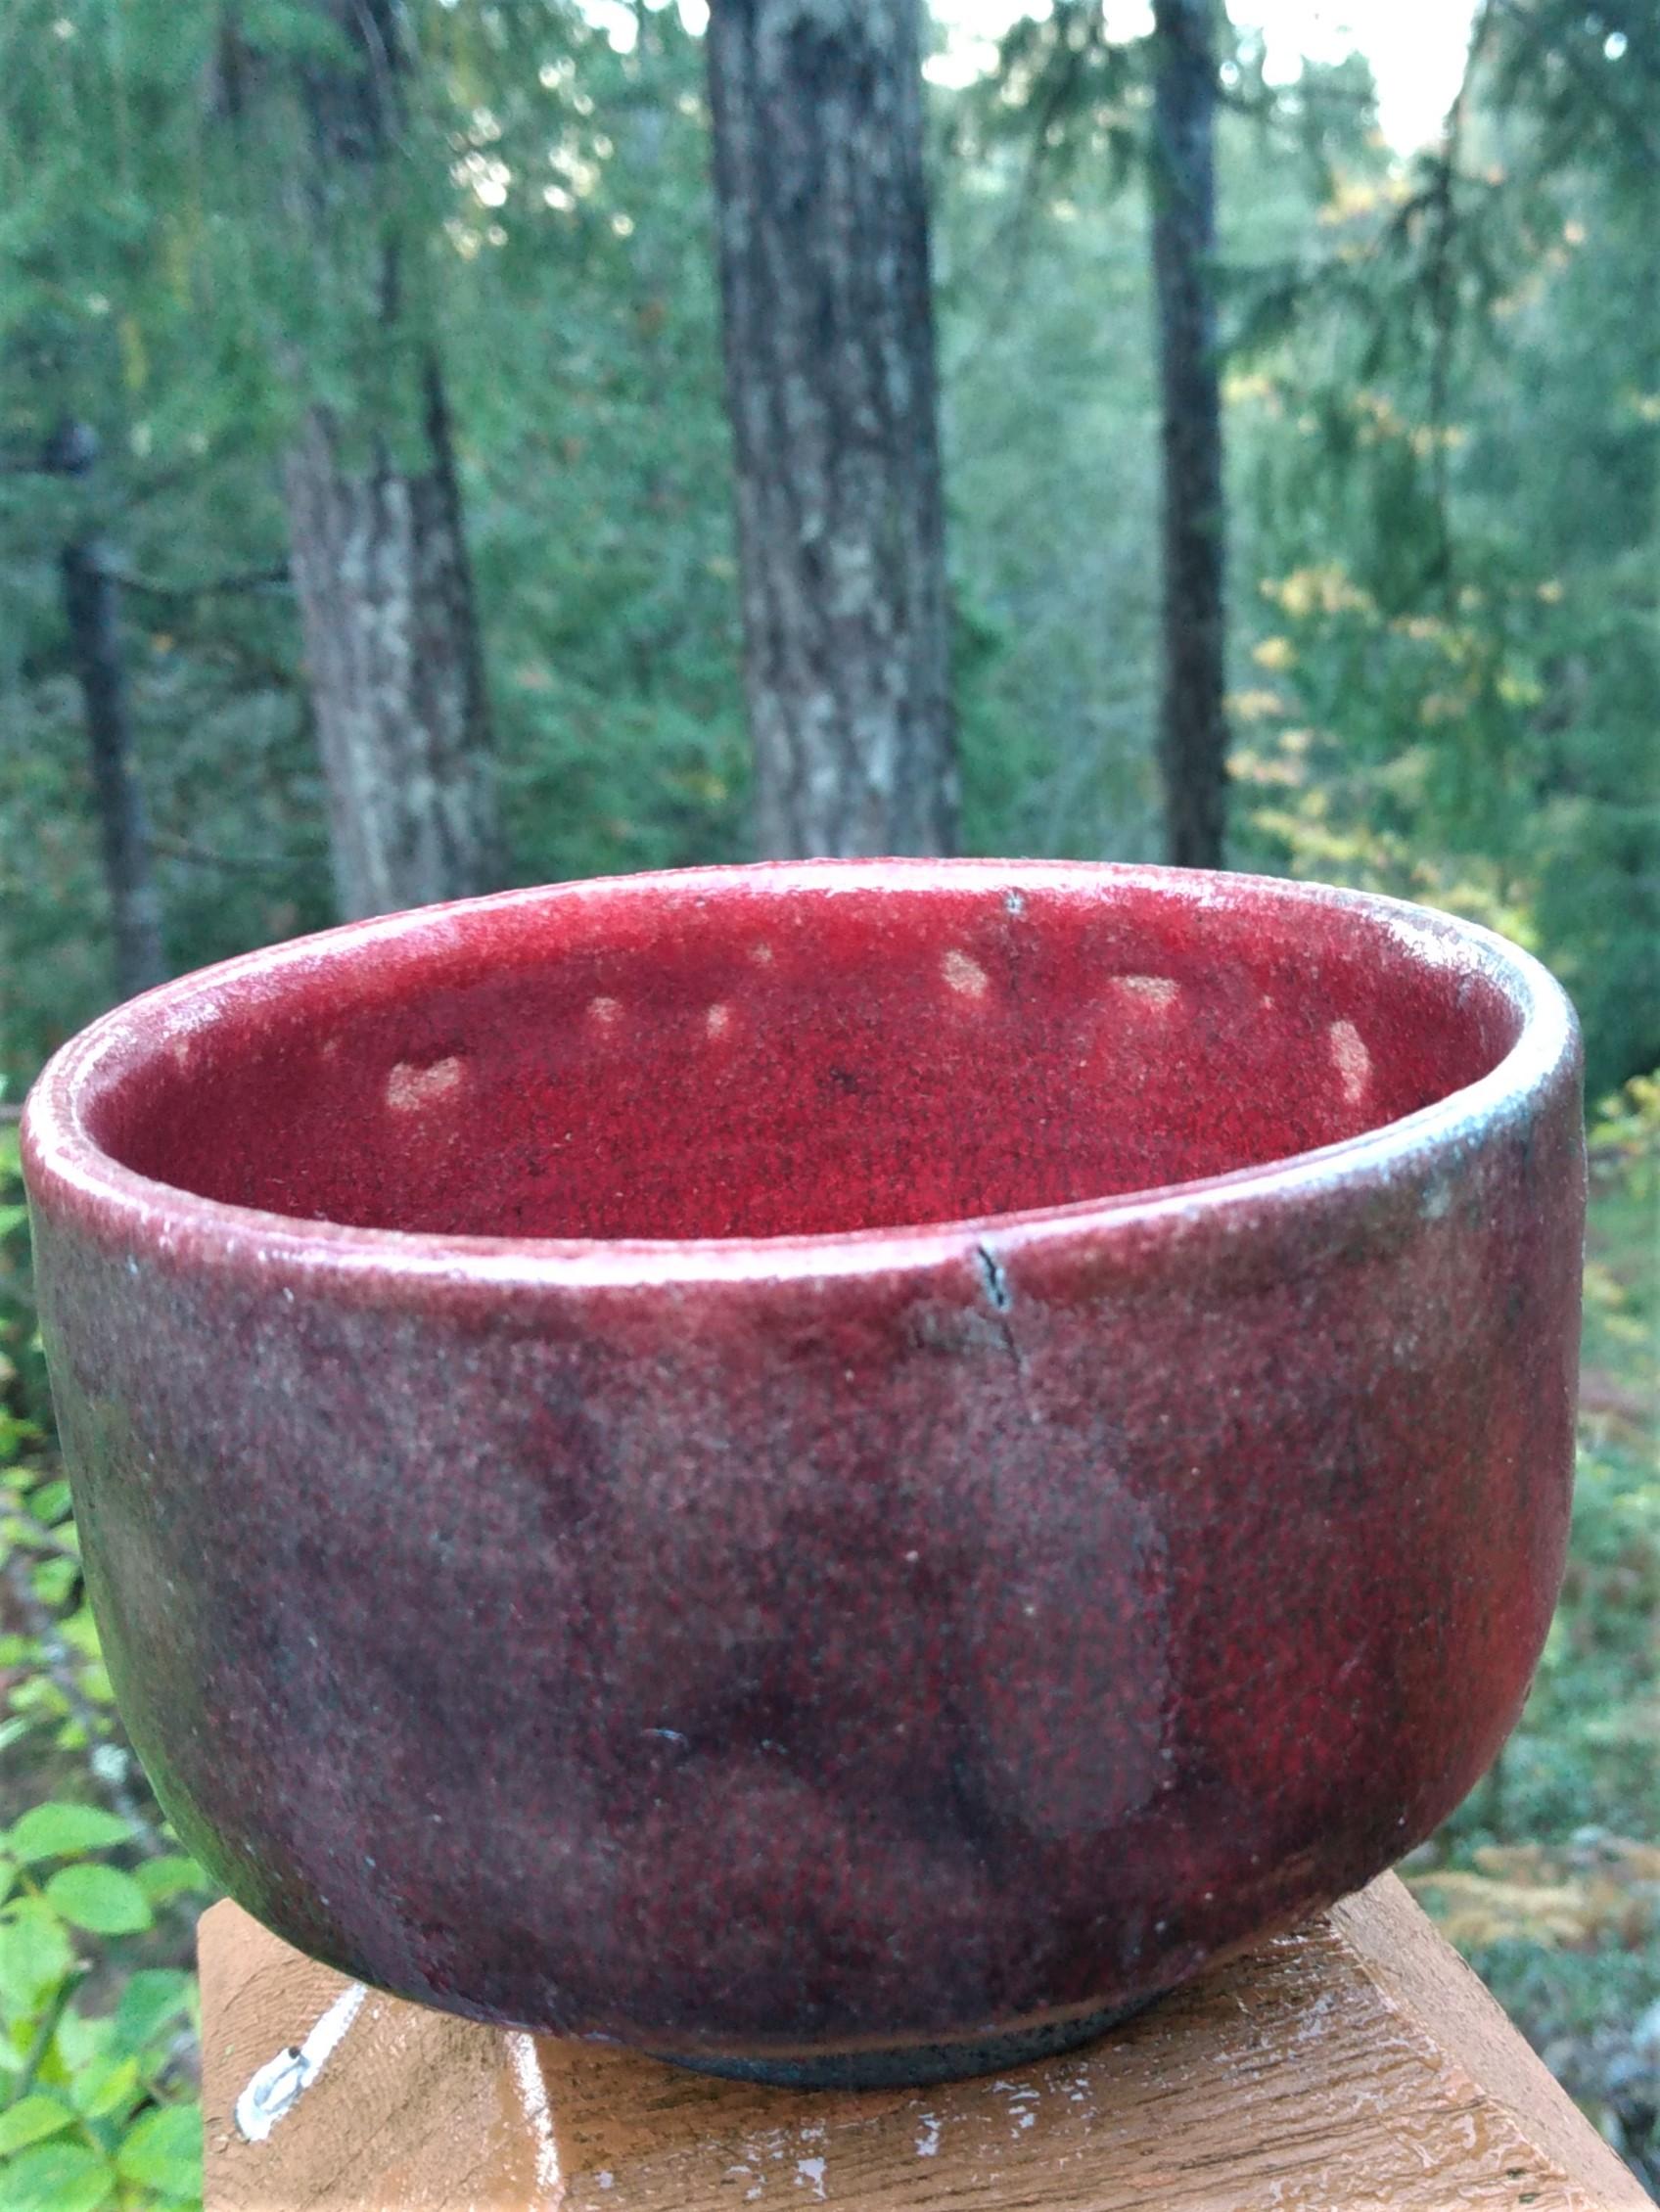 wayne's bowl